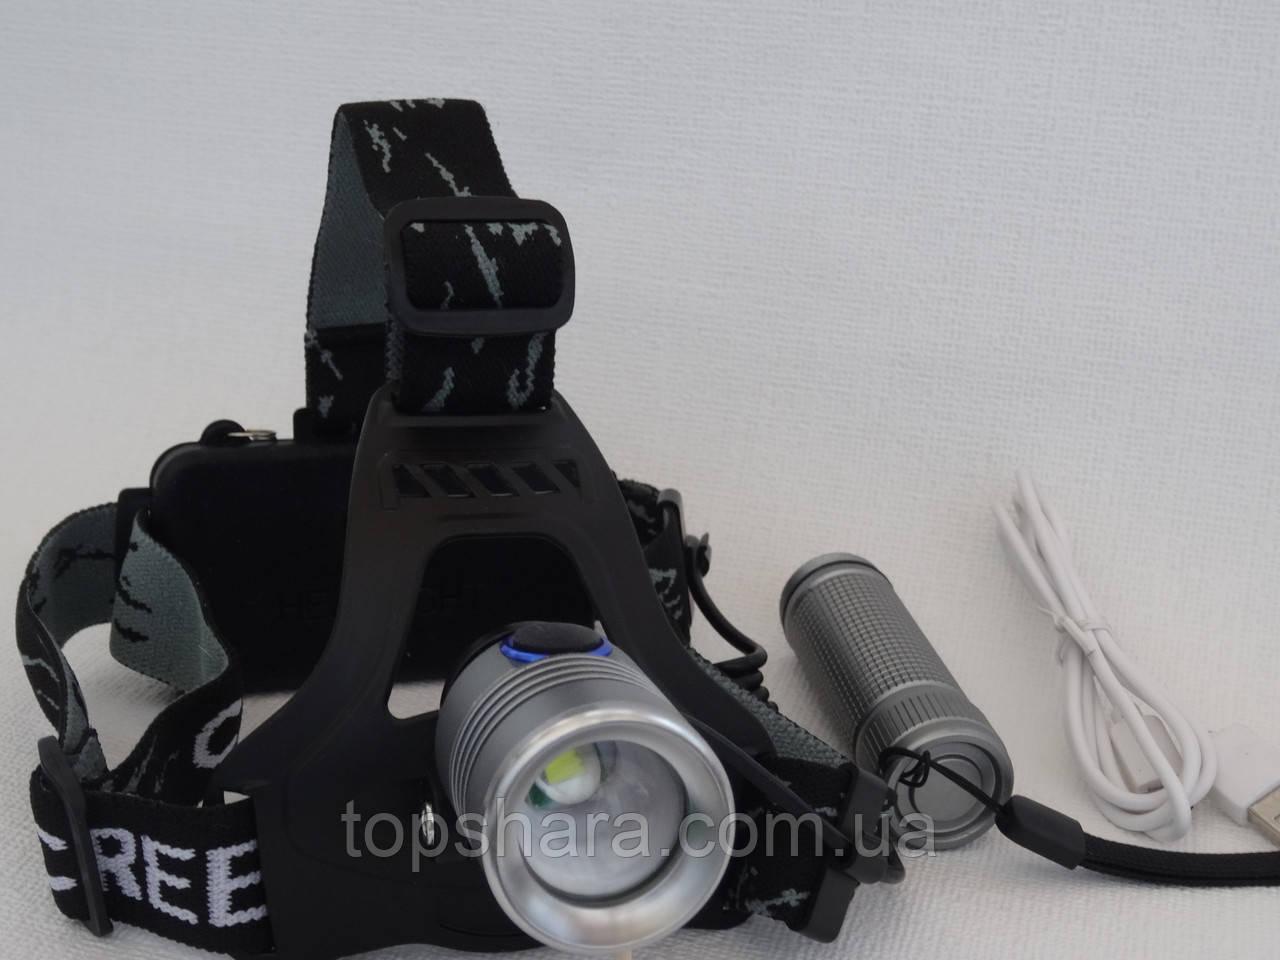 Фонарик налобный+ручной 2в1 Police BL-TS18-T6 158000W